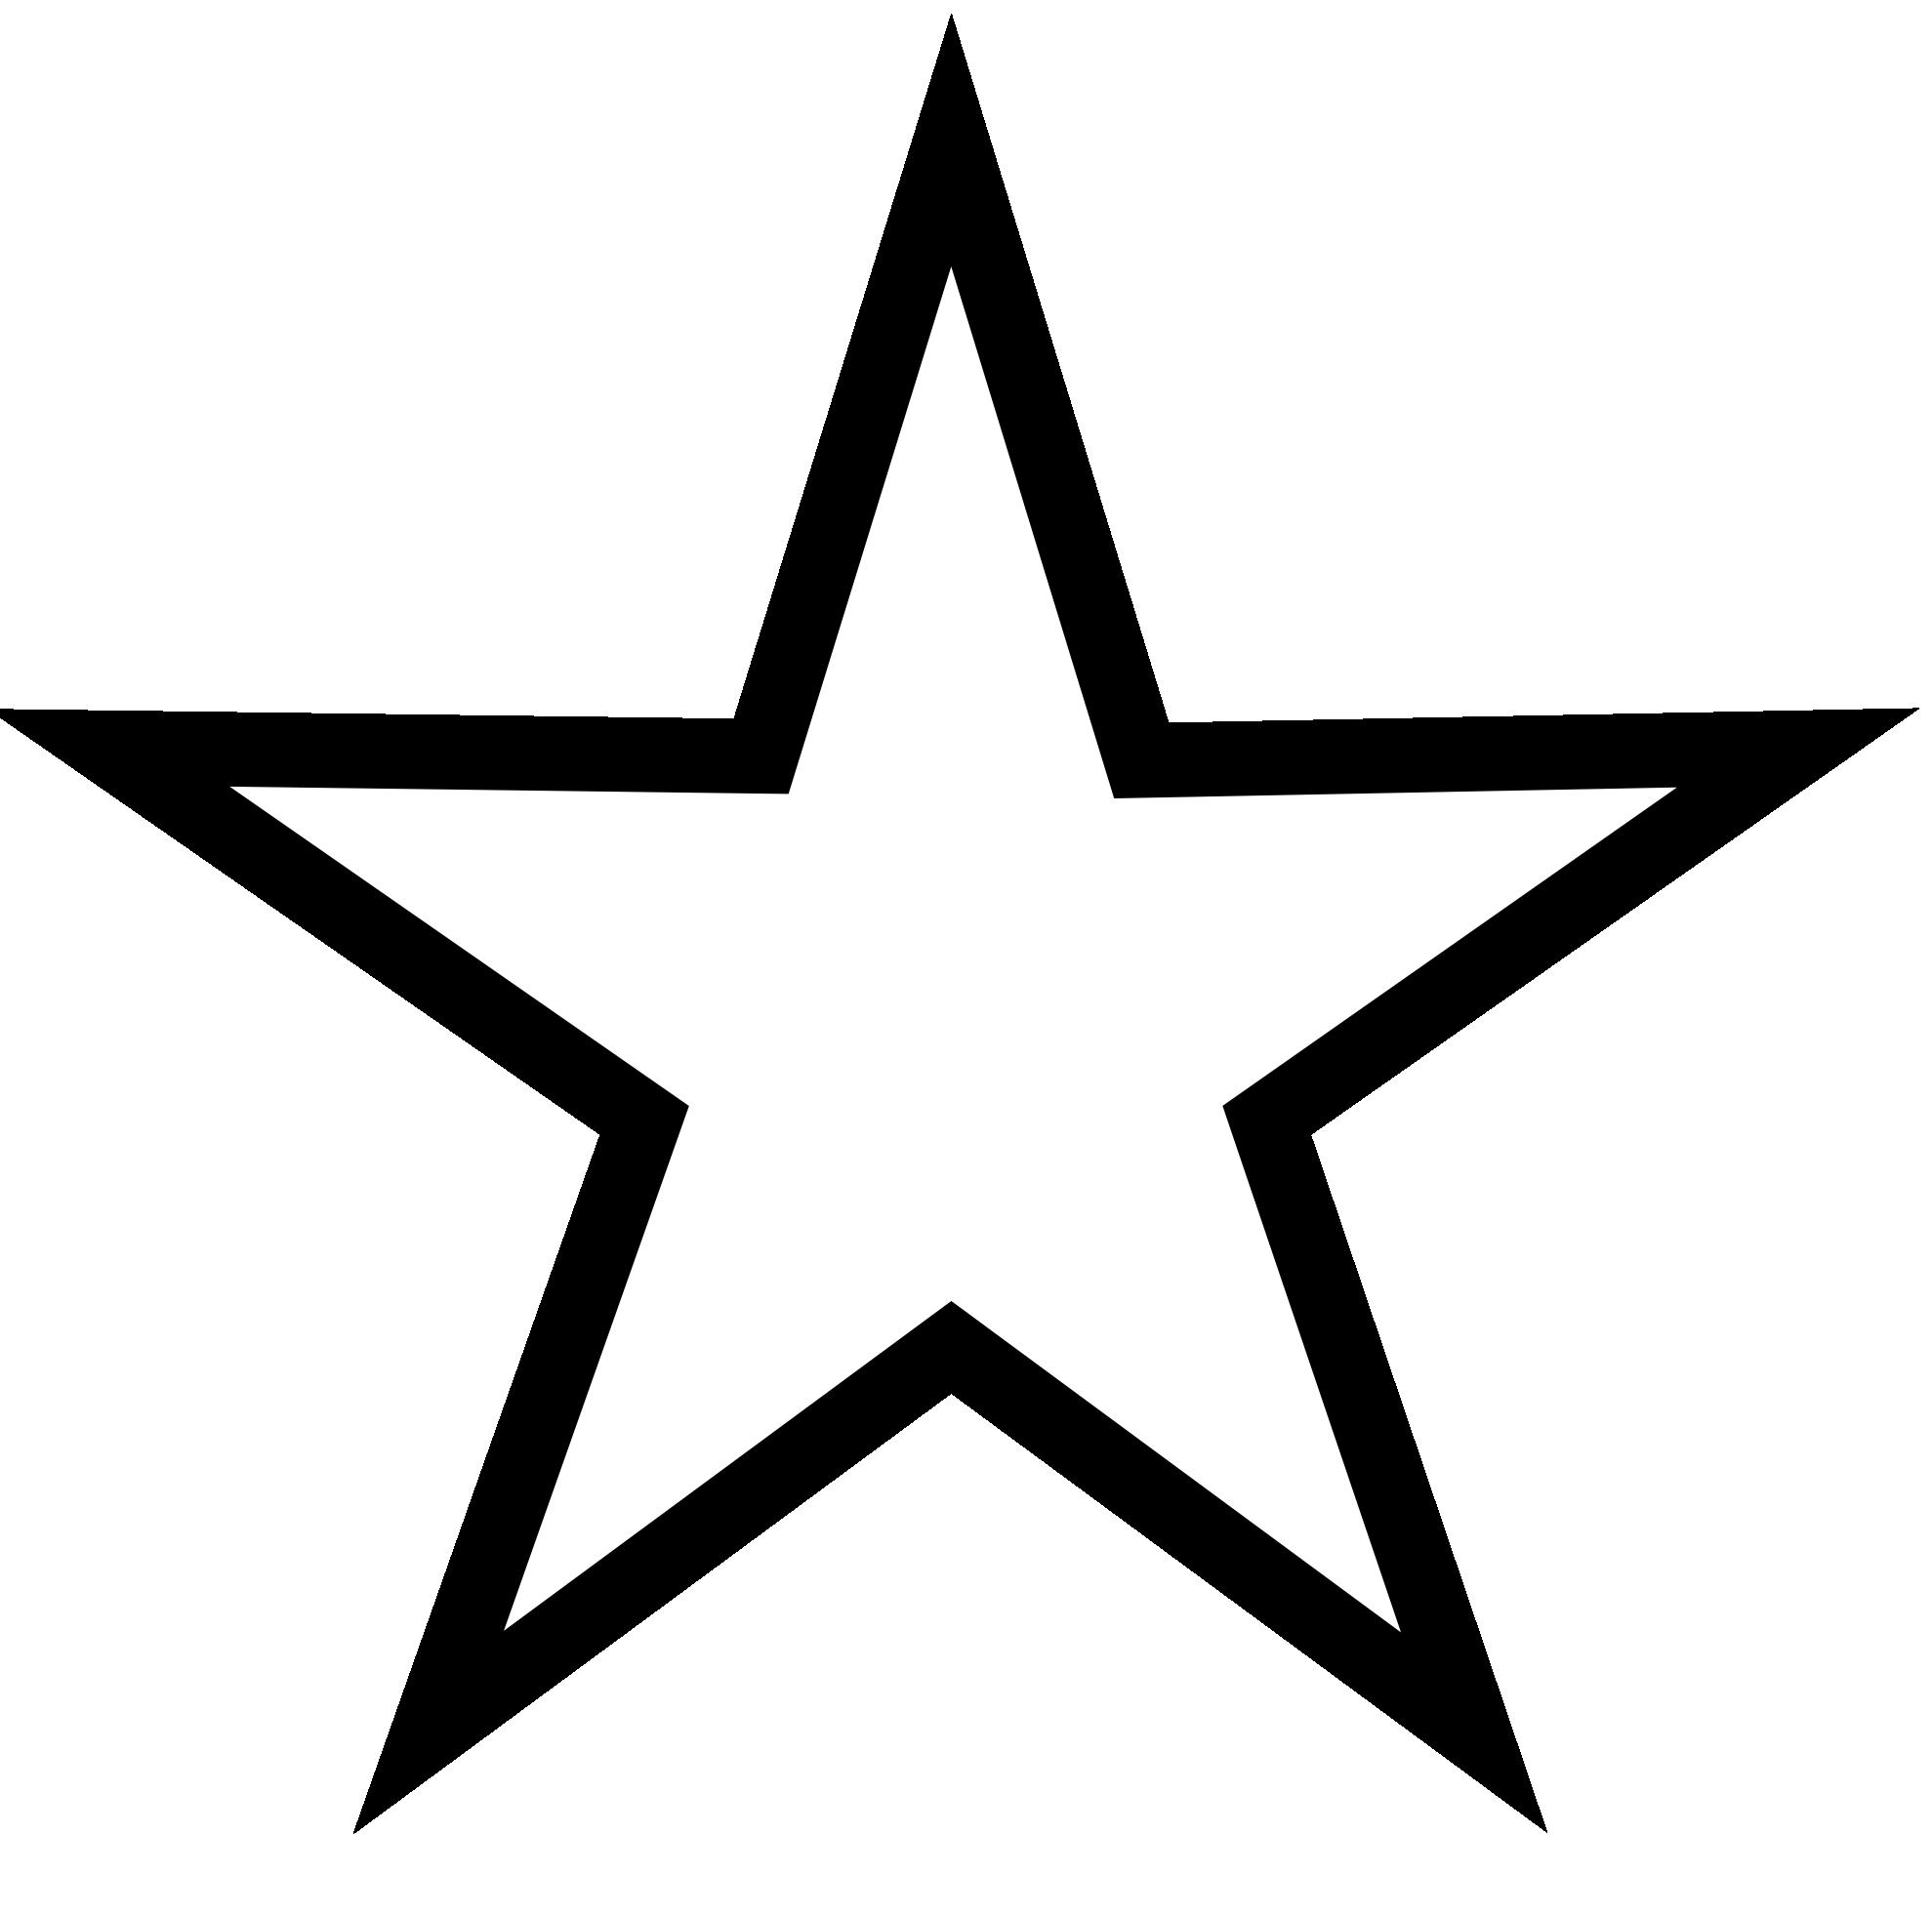 звезды раскраска на прозрачном фоне хотите